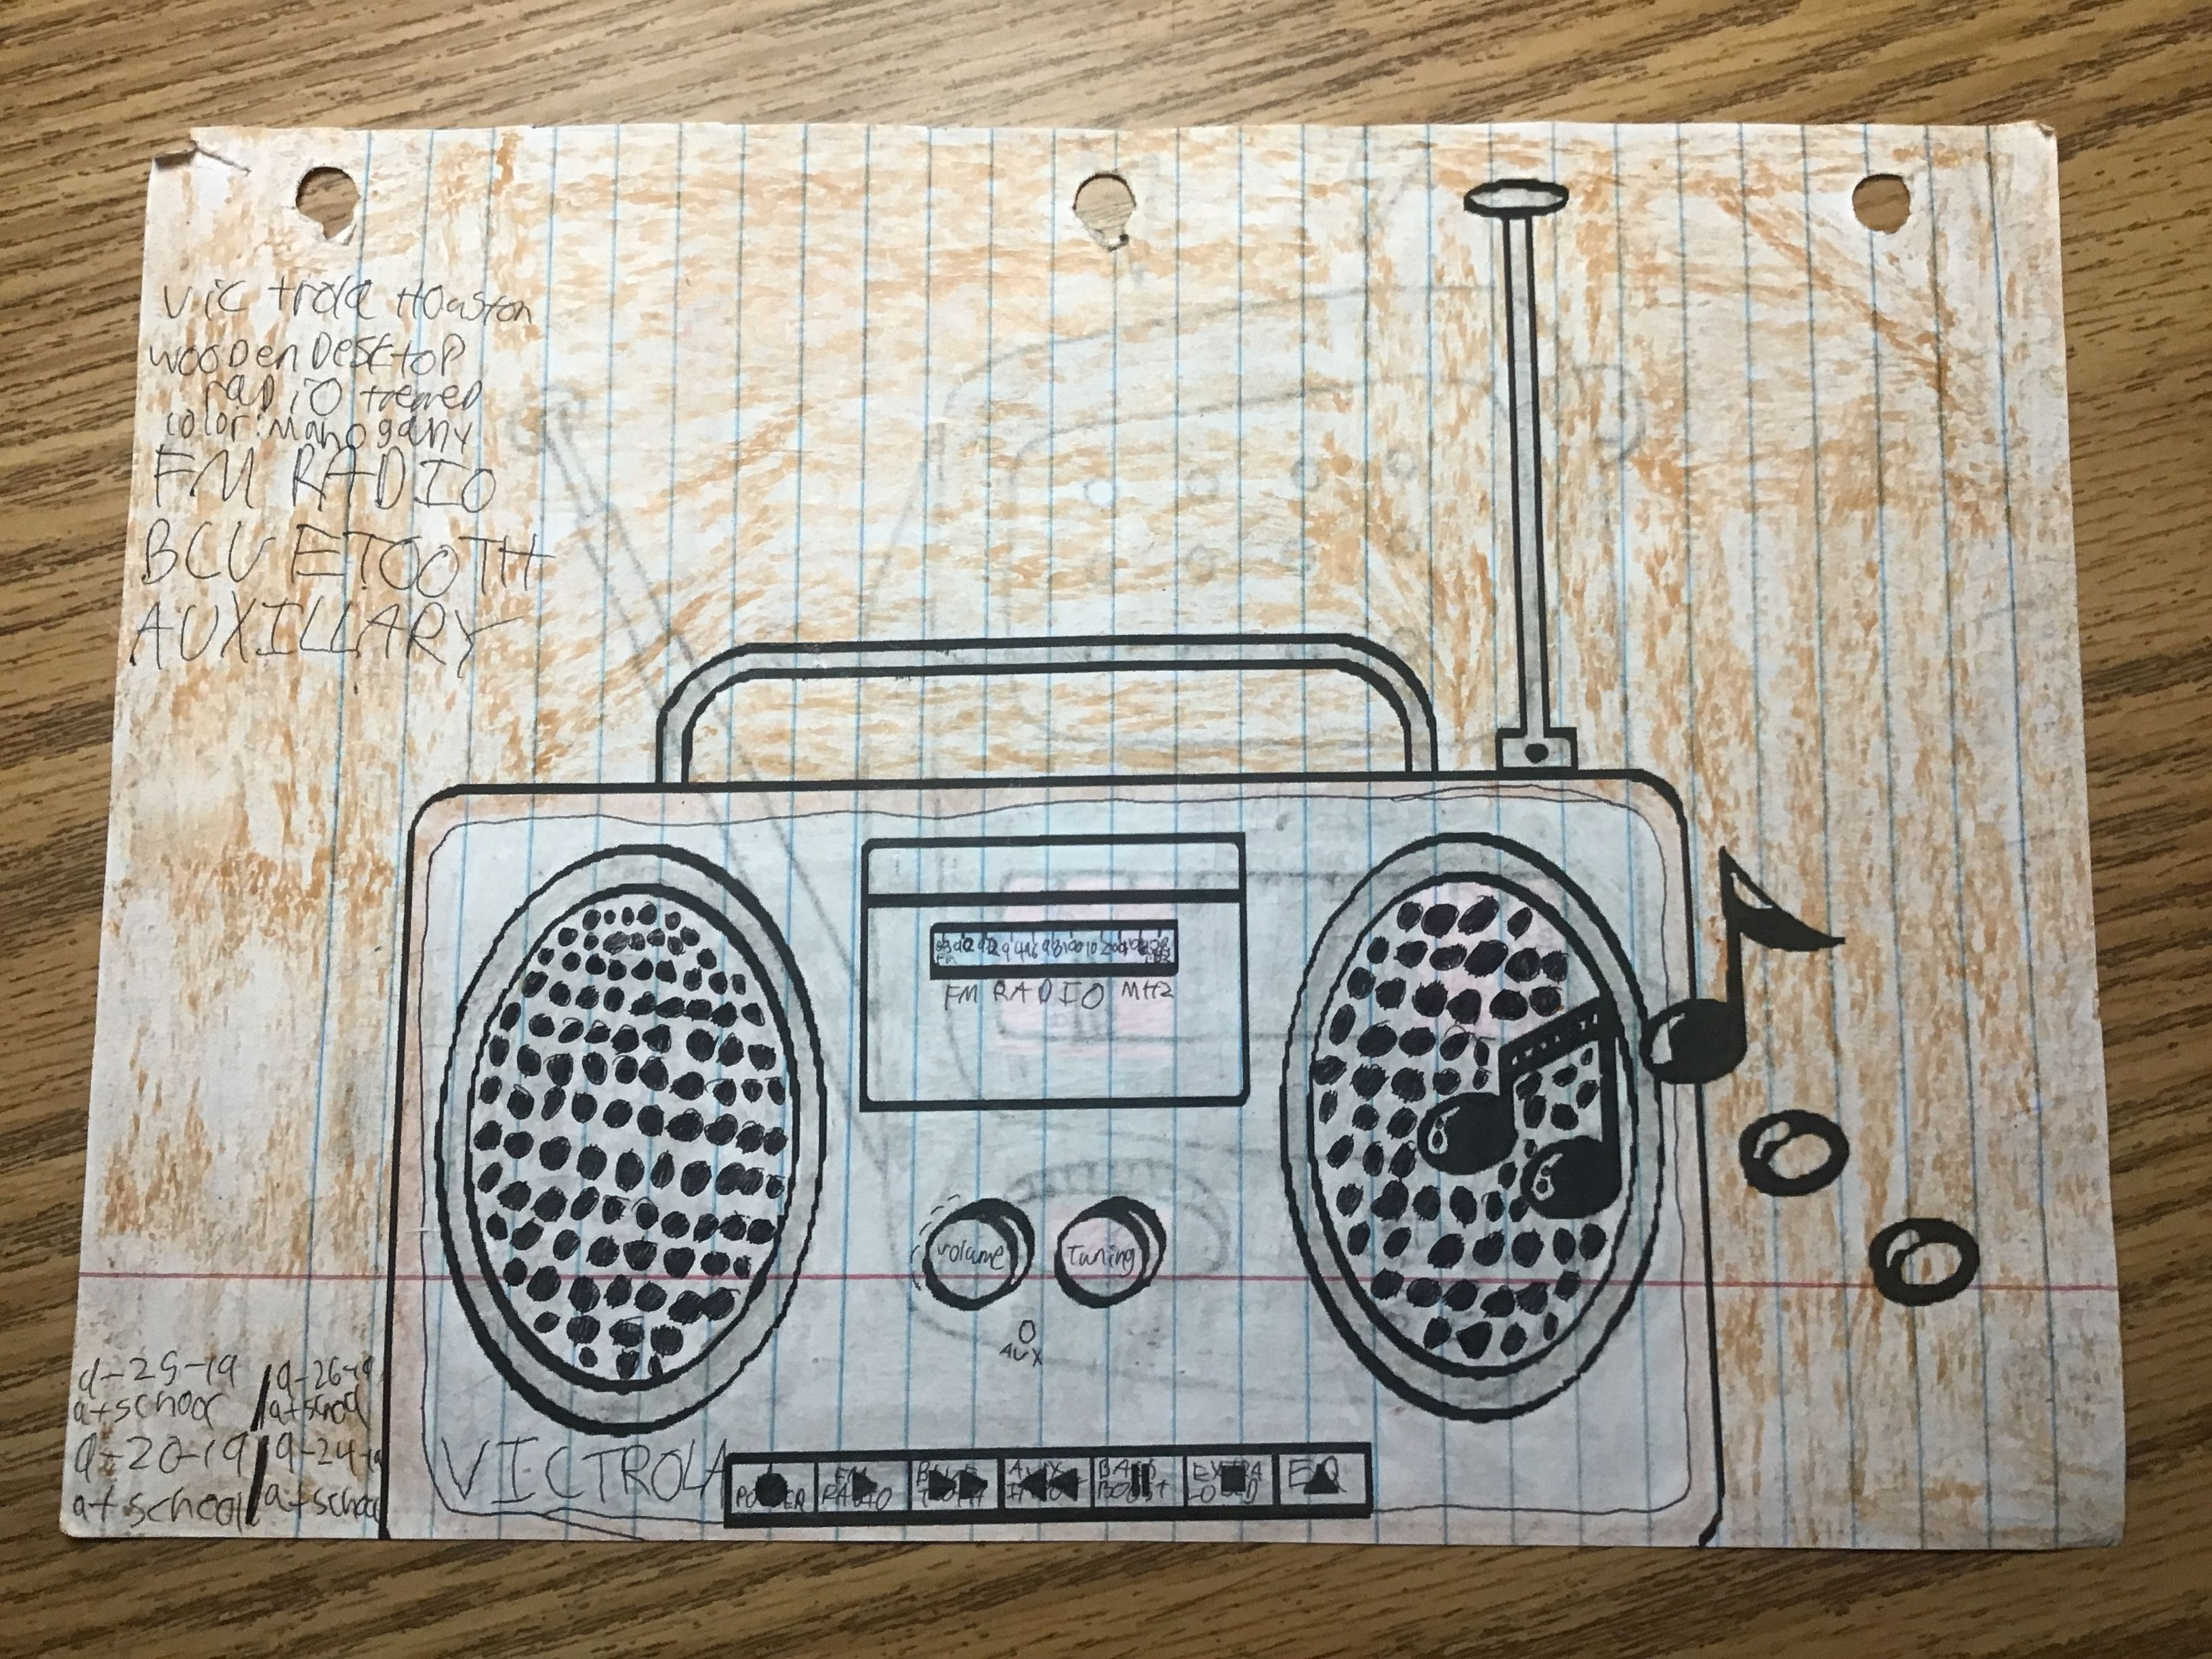 Victrola Houston Wooden Desktop Radio Themed Coloring Sheet 9 20 19 9 24 19 9 25 19 9 26 19 Wireless Streaming Fm Radio Bluetooth Radio